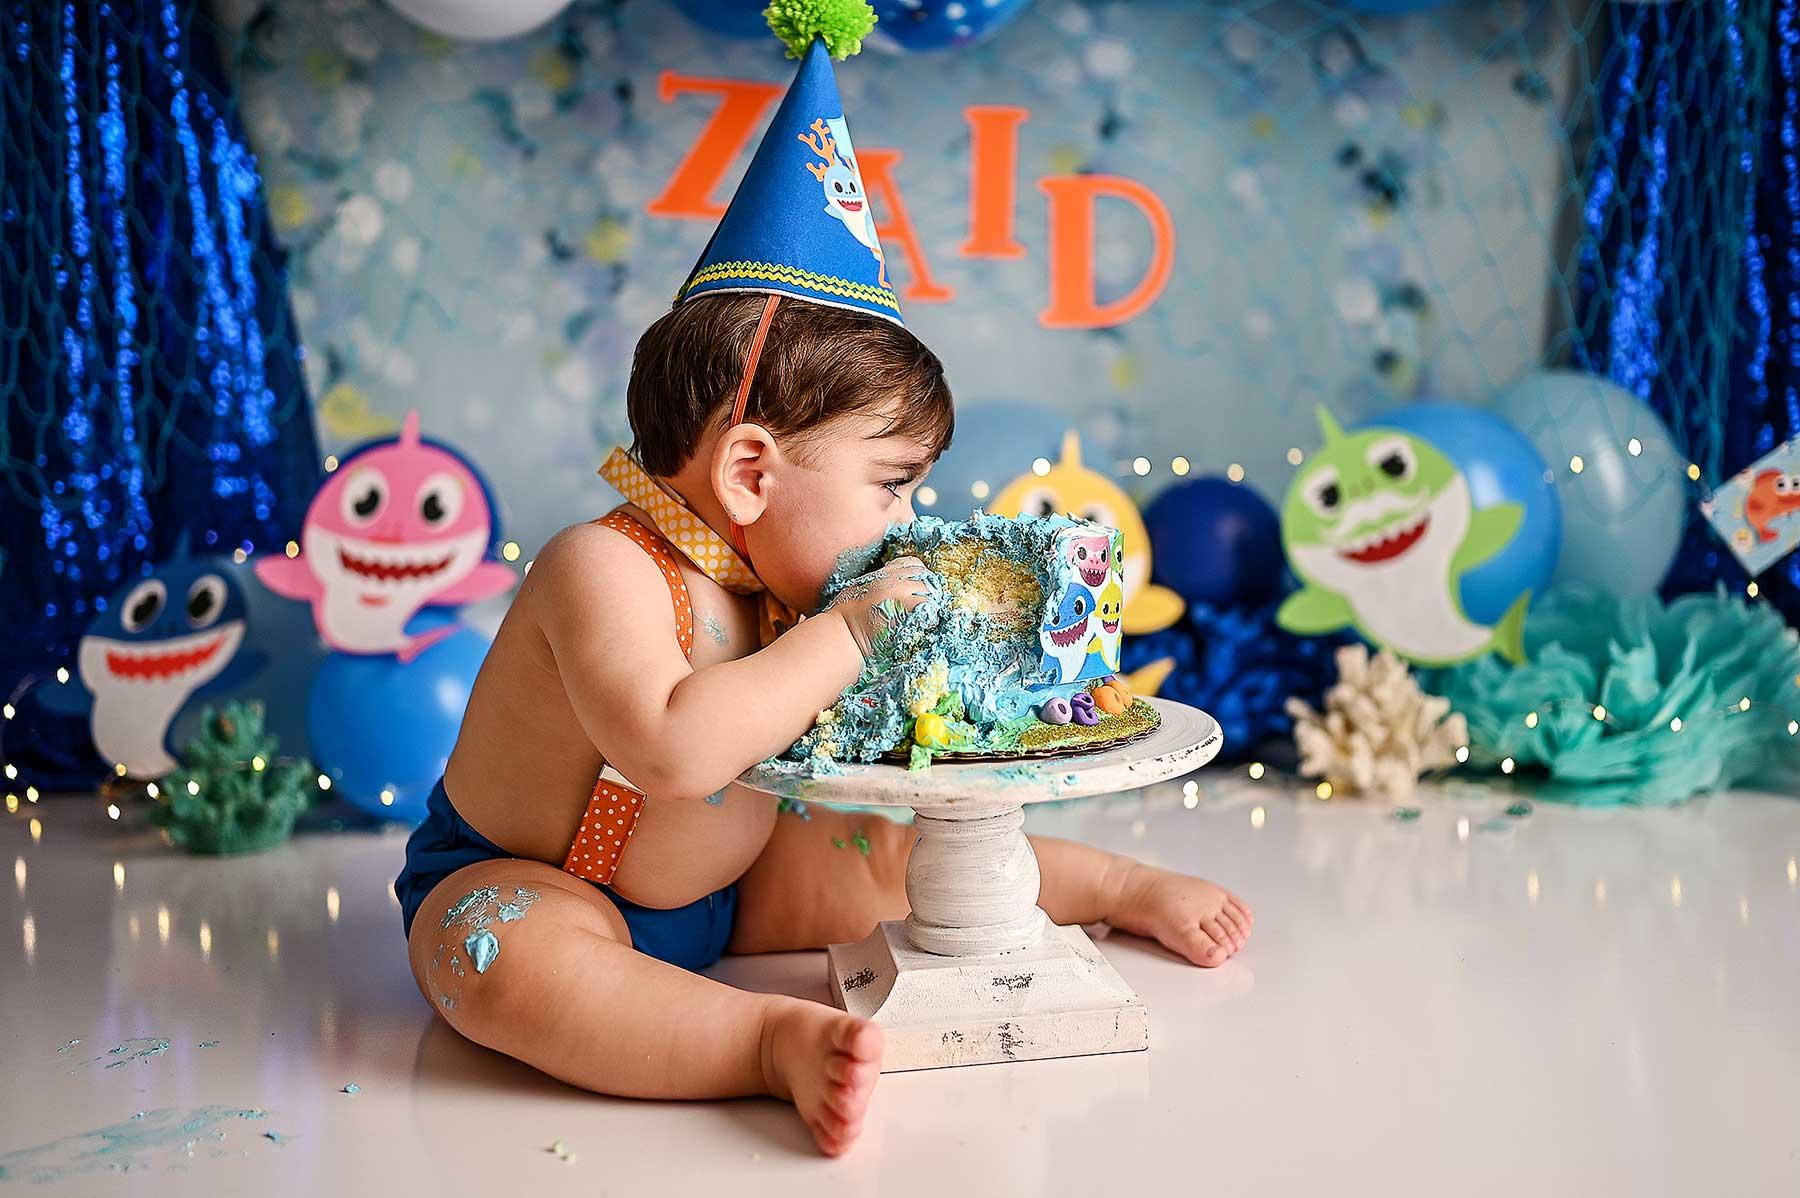 best cake smash nyc portrait photographer nyc baby shark pre-cake smash